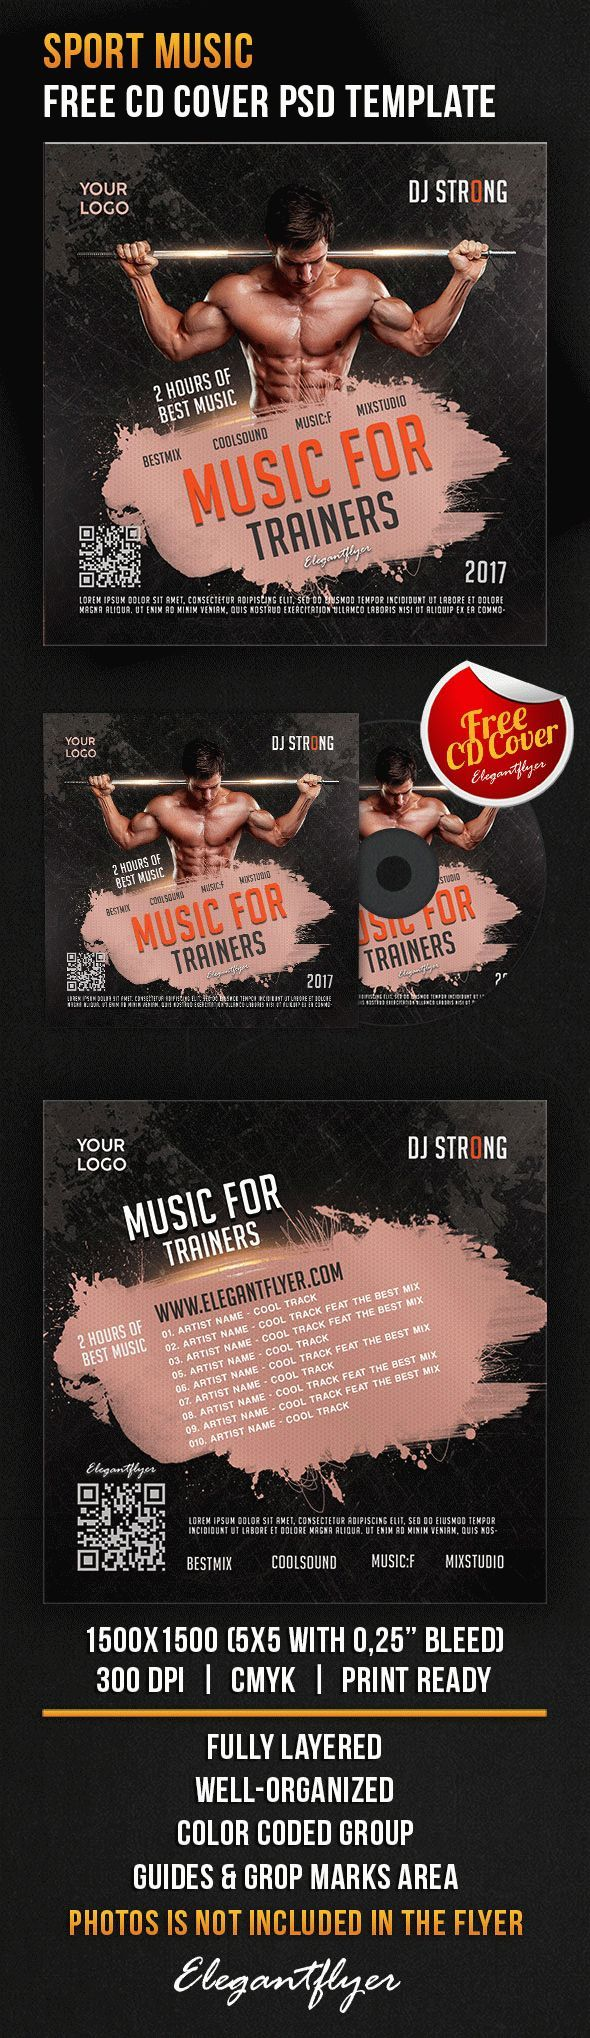 https://www.elegantflyer.com/free-cd-dvd-templates/sport-music-free-cd-cover-psd-template/